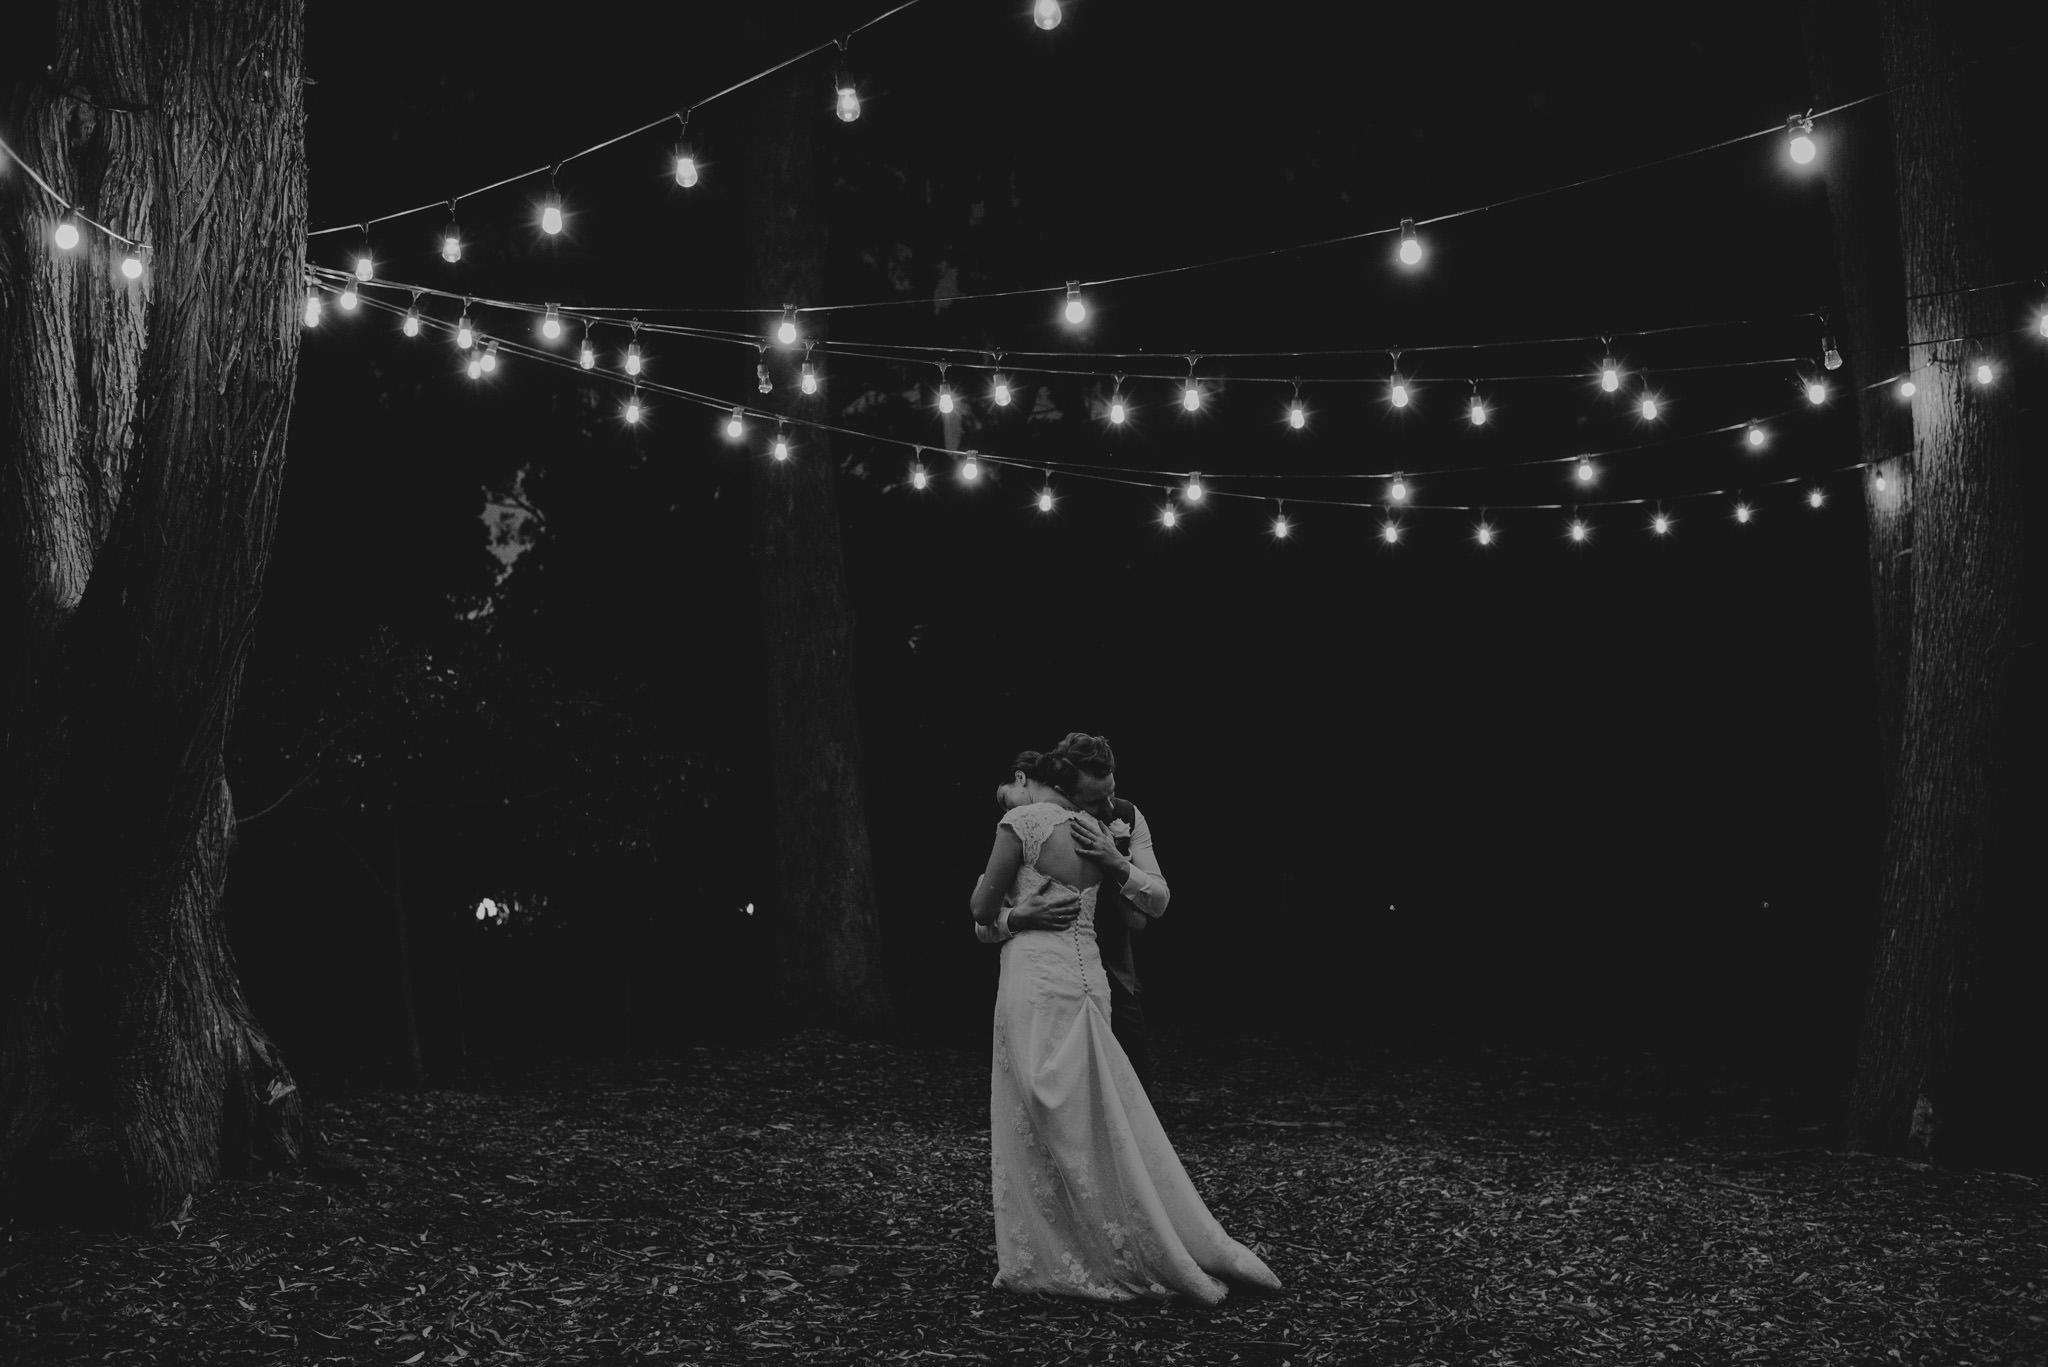 New-Black-Studios_Adam-Ward-Wedding-Photographer8.jpg